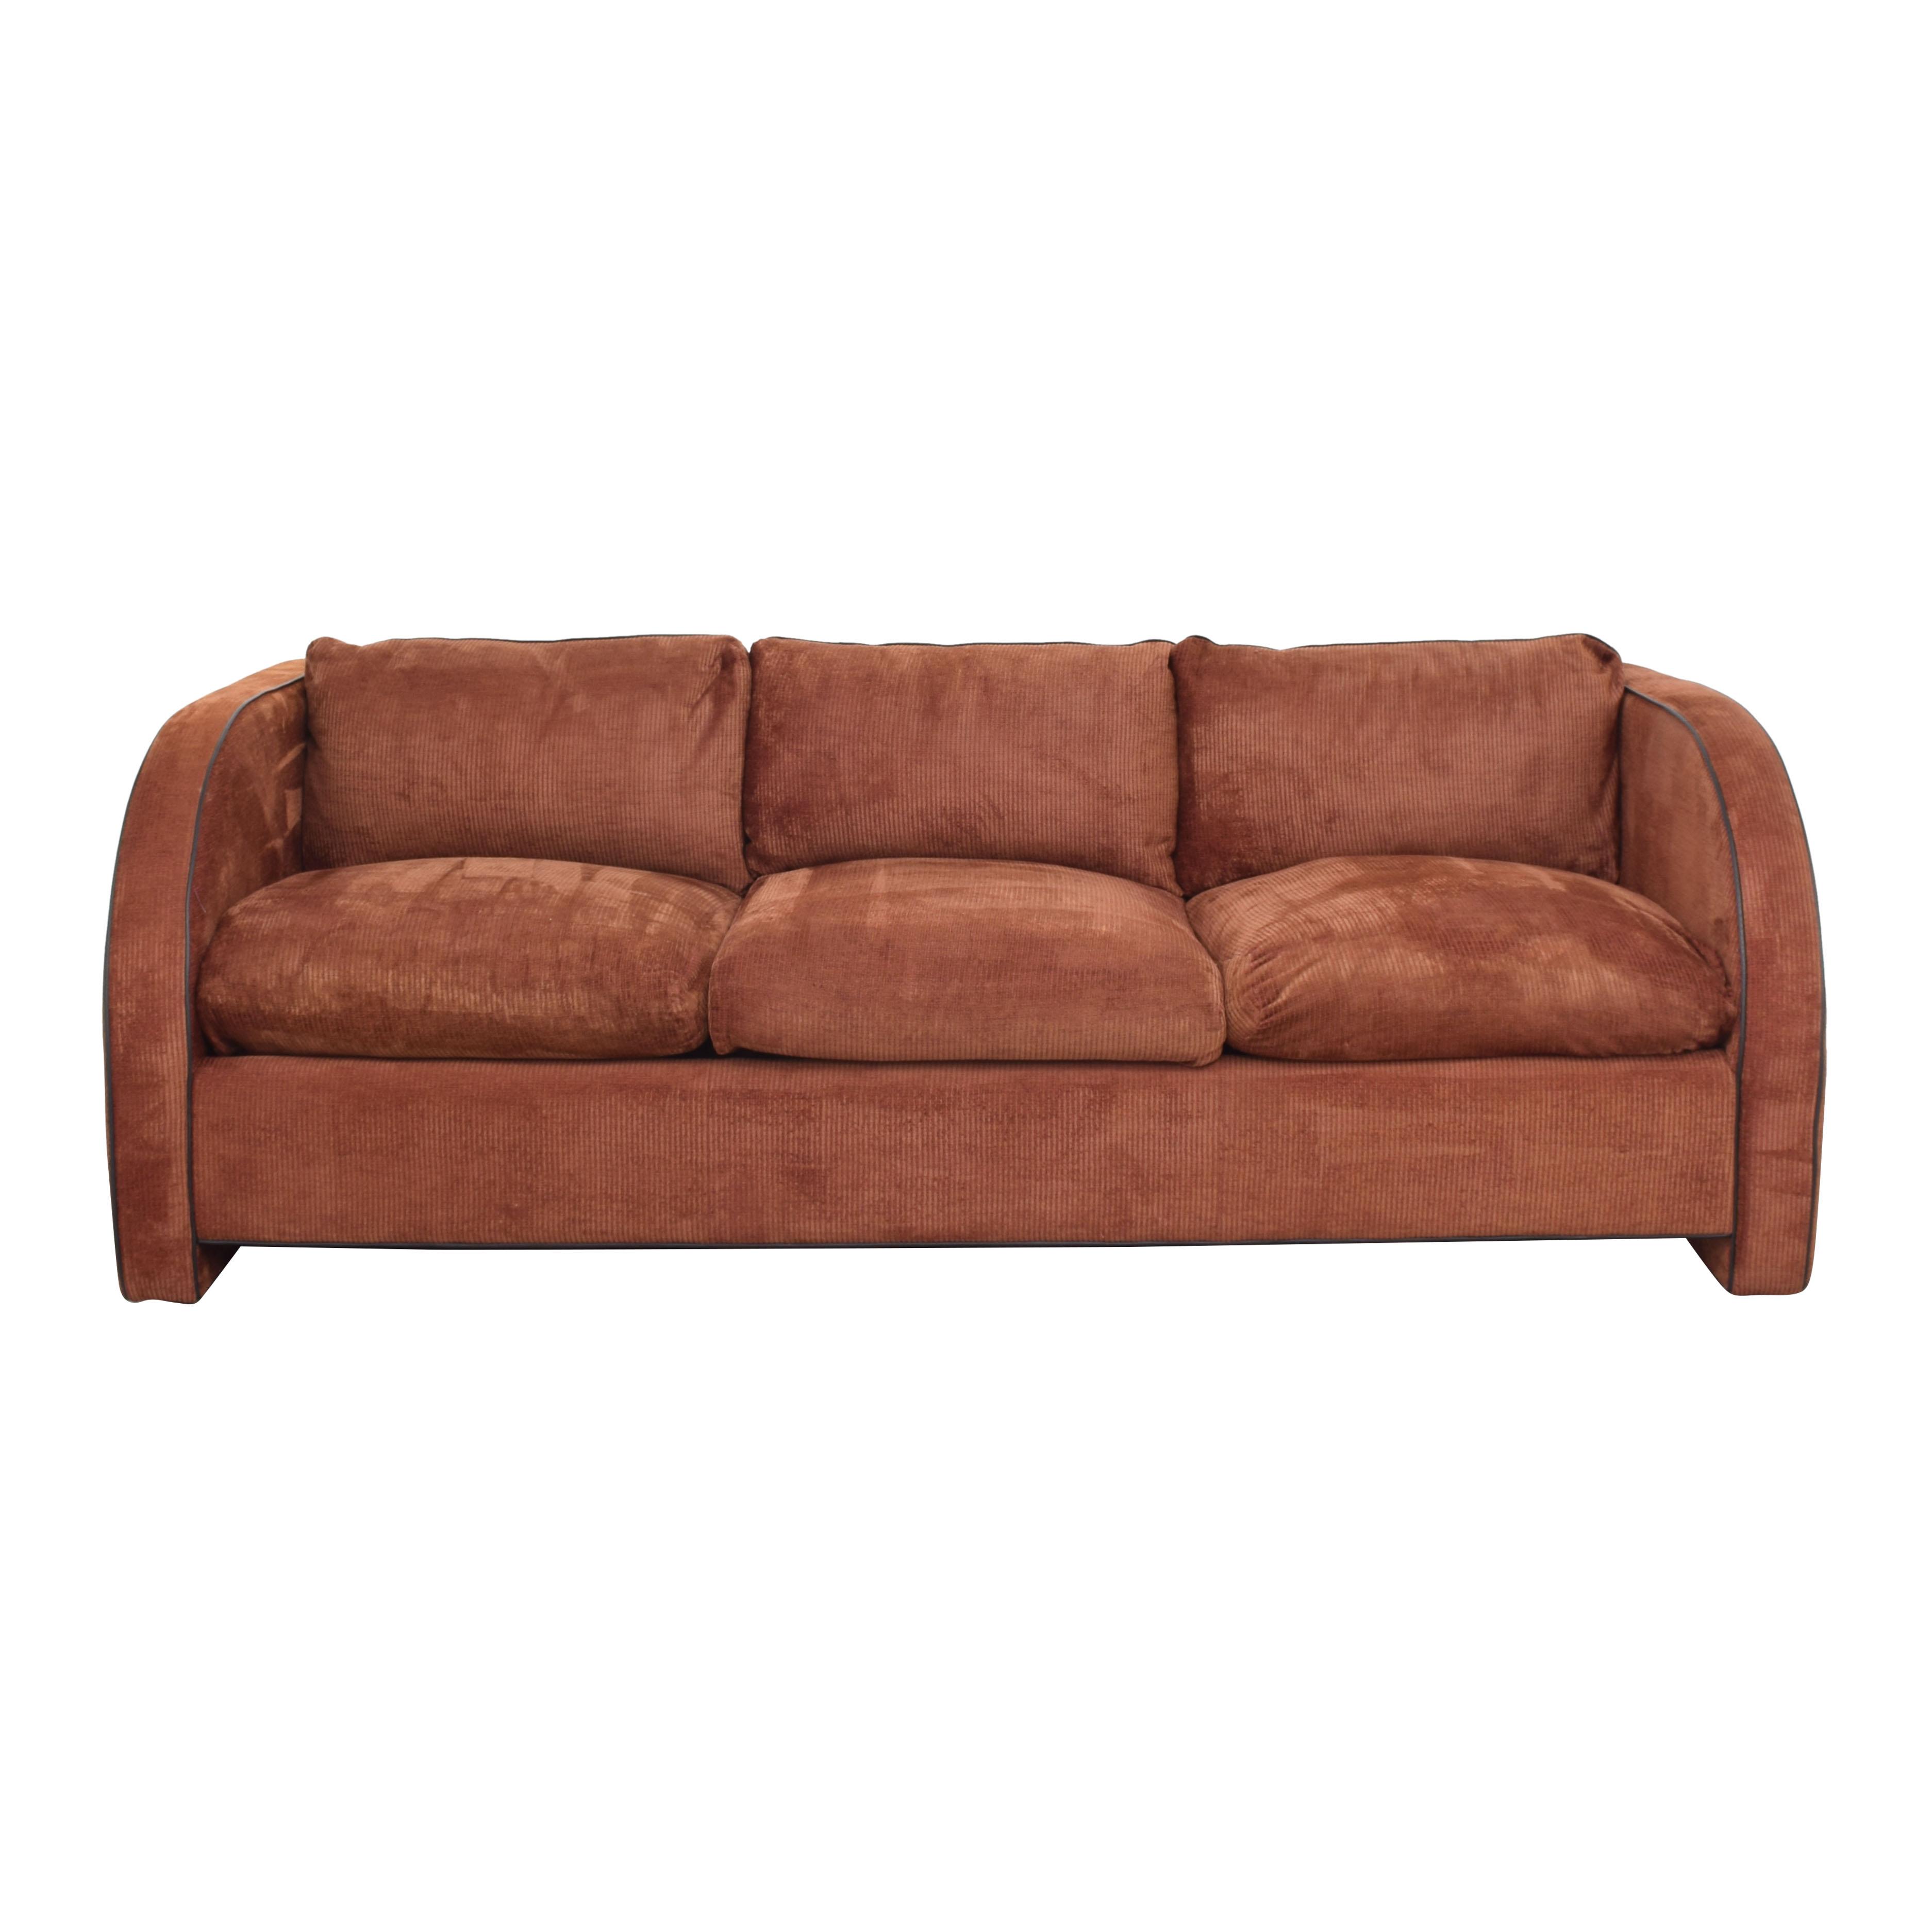 Avery Boardman Avery Boardman Three Cushion Sofa price